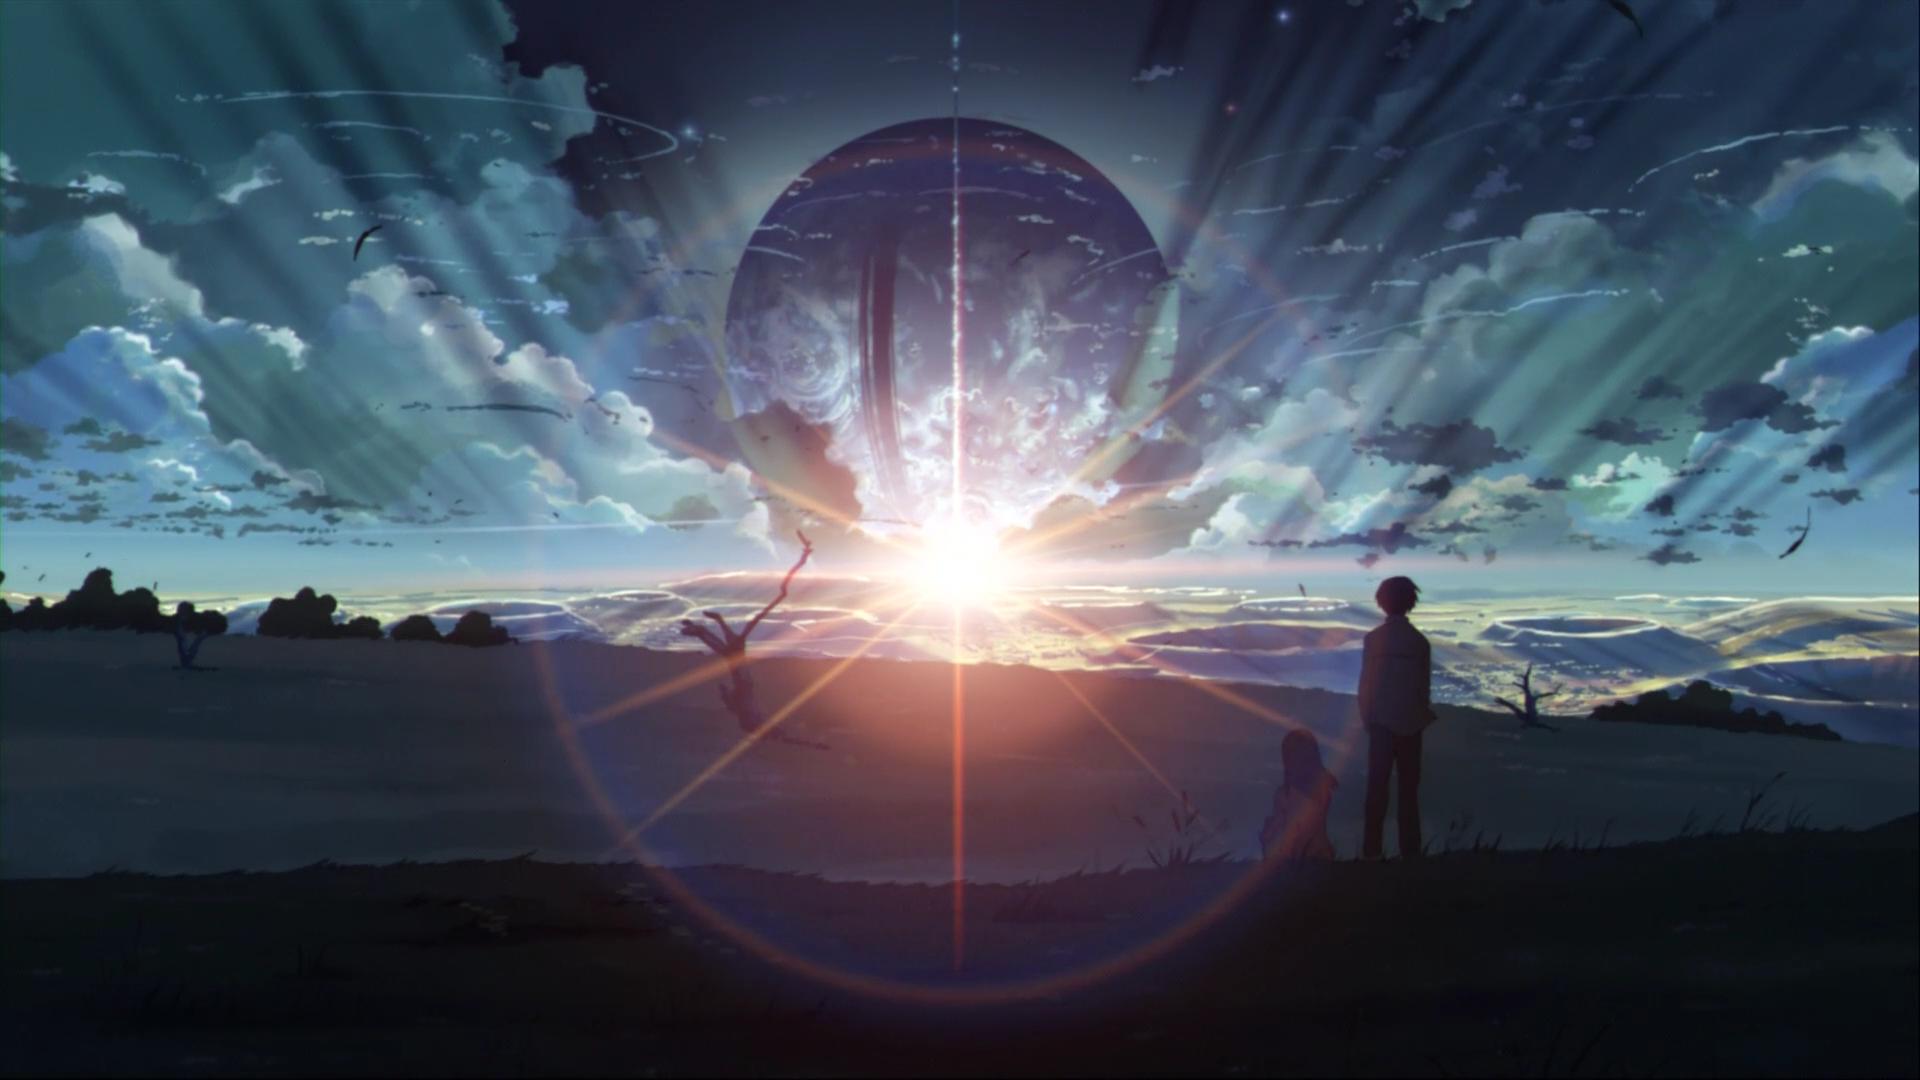 Awesome Fantasy World Artwork Anime Hd Wallpaper - 5 Centimeters Per Second - HD Wallpaper